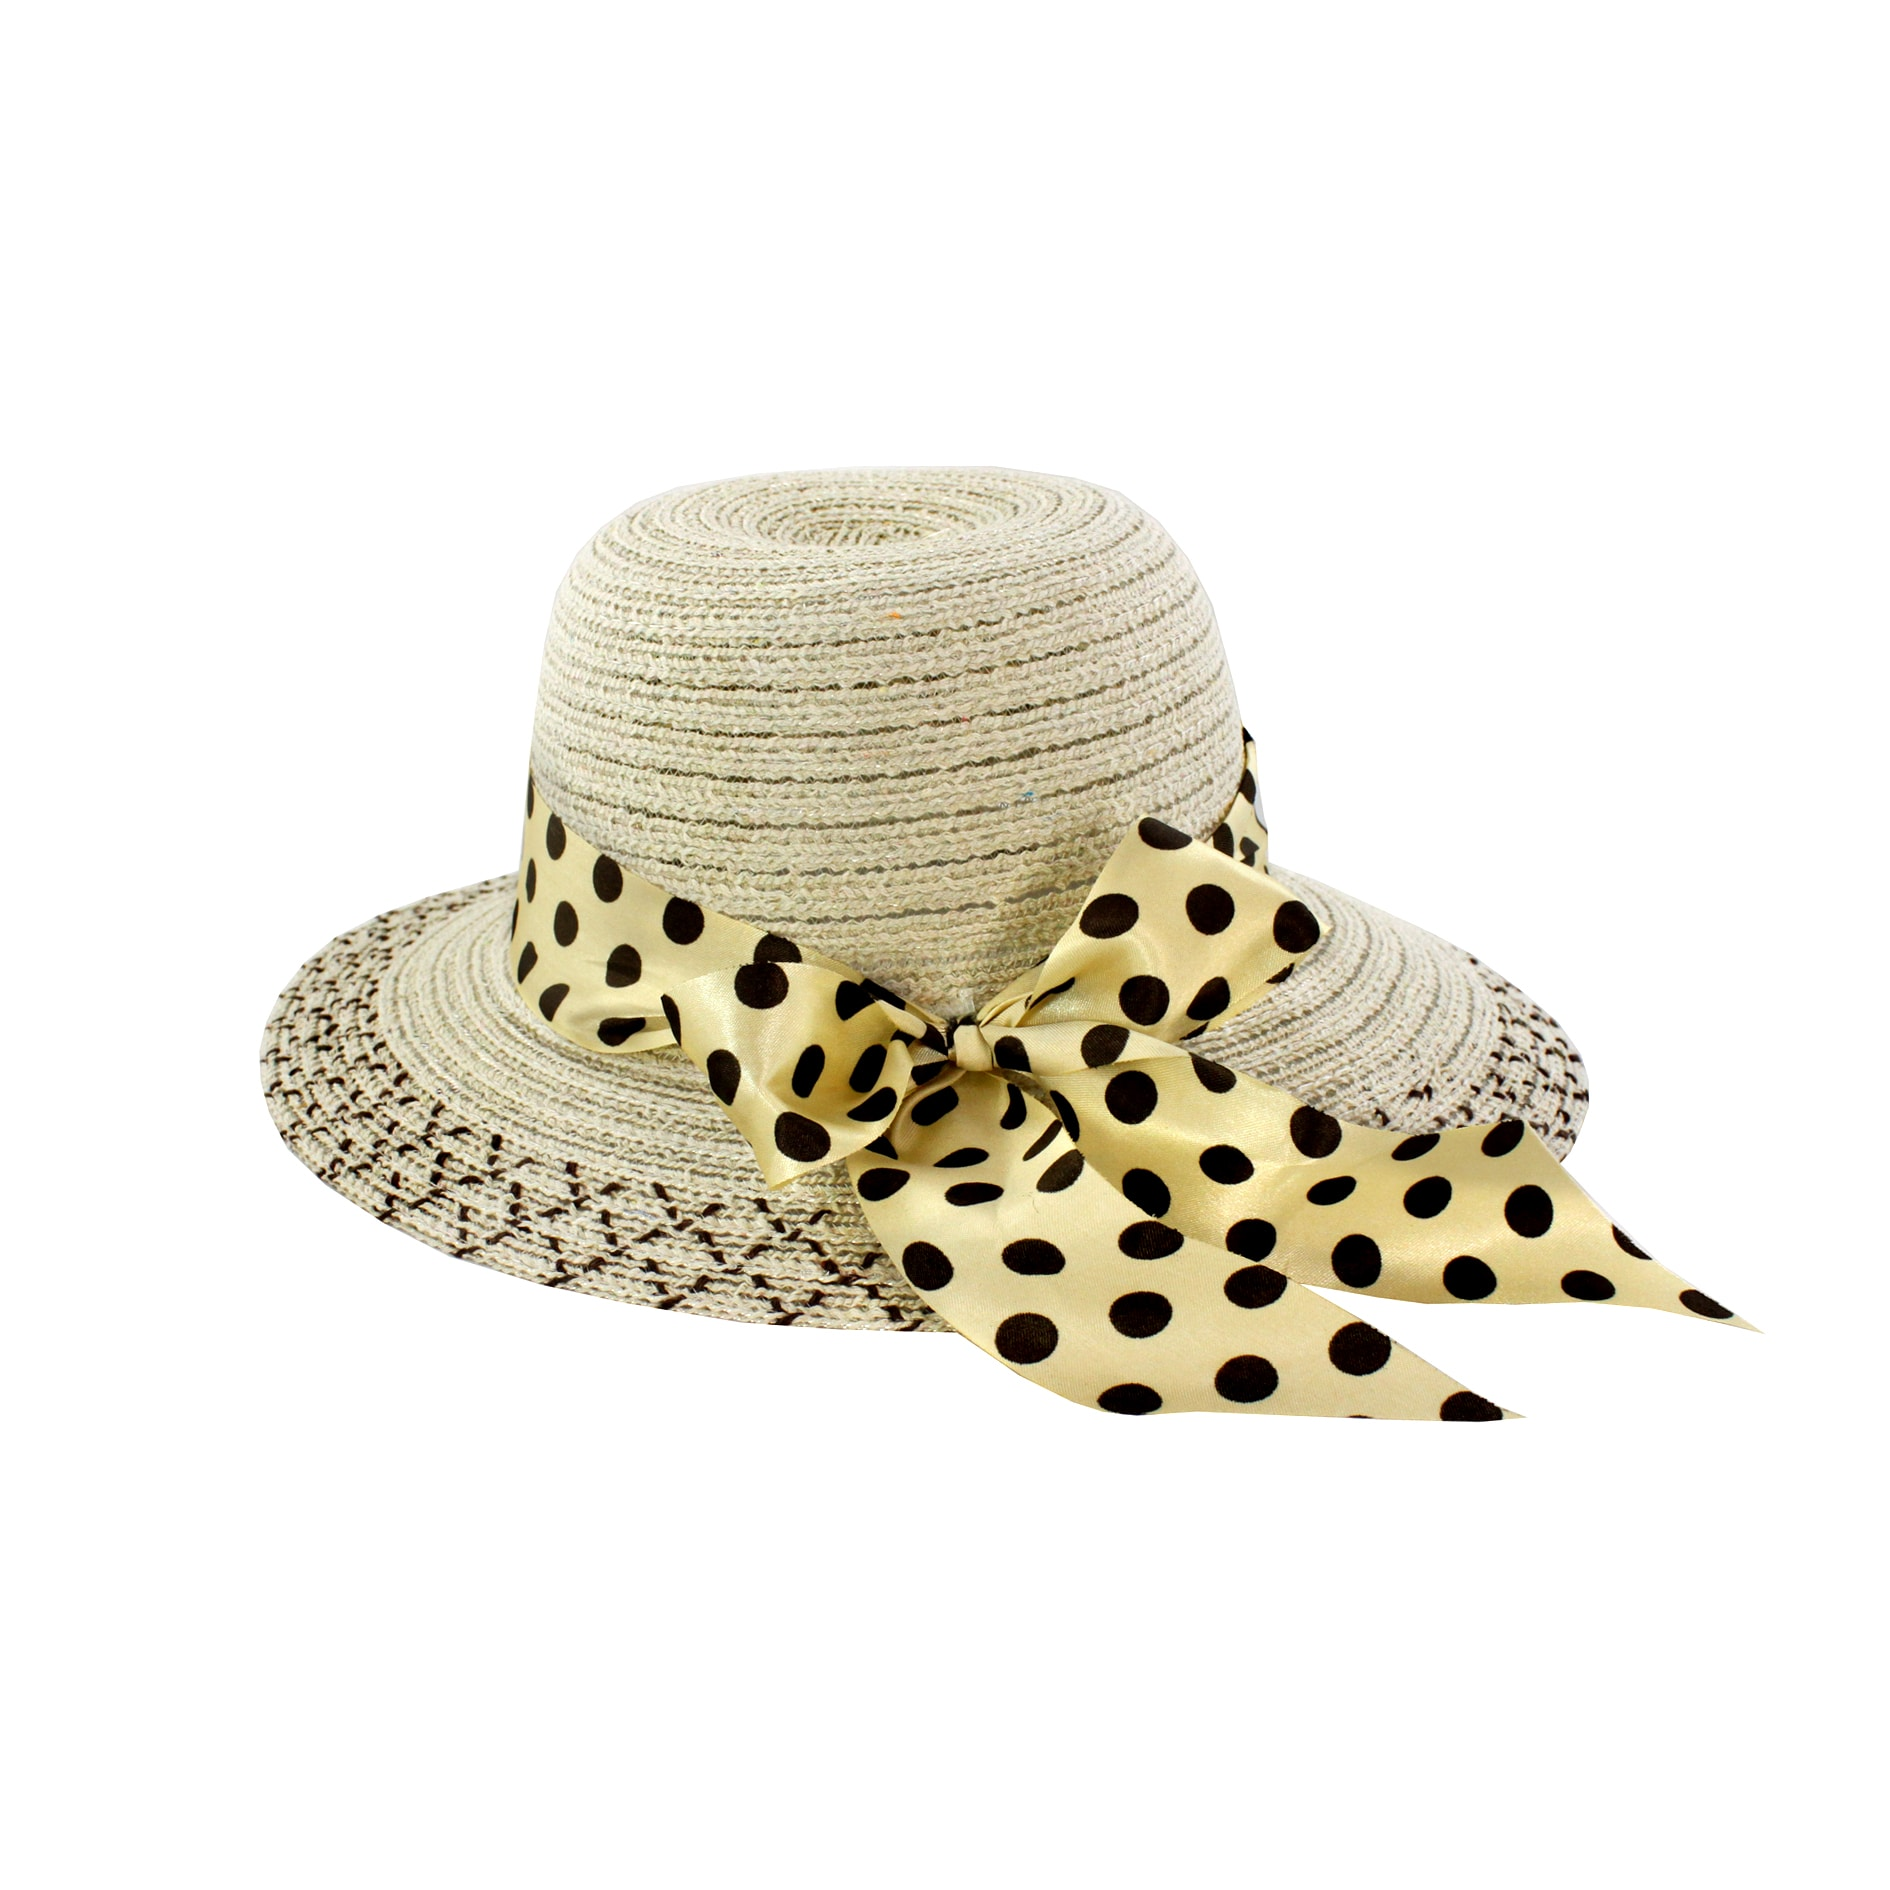 Faddism Women's Beige Bow Detail Sun Hat